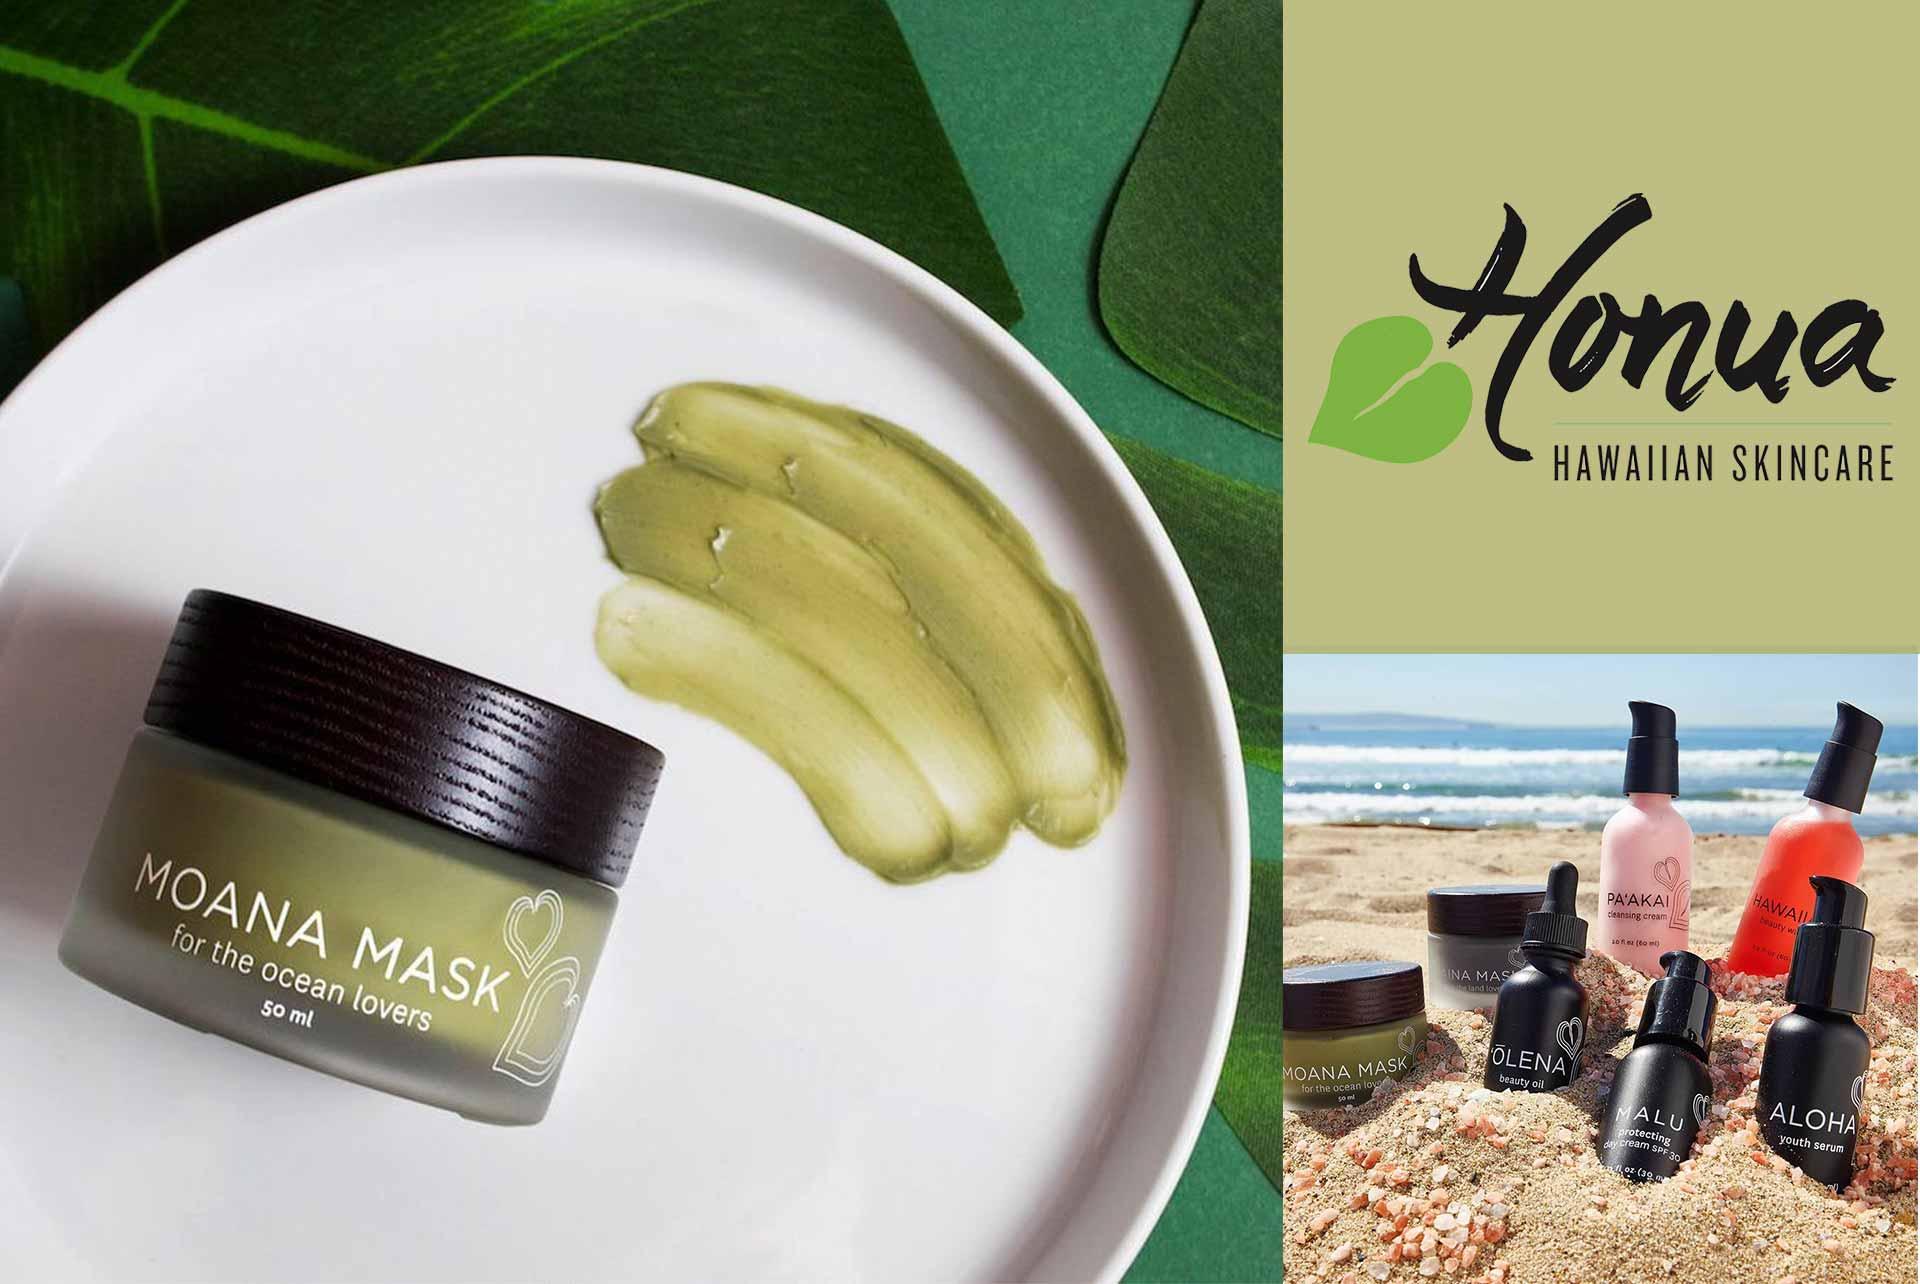 Is Honua Hawaiian Skincare Cruelty-Free & Vegan?